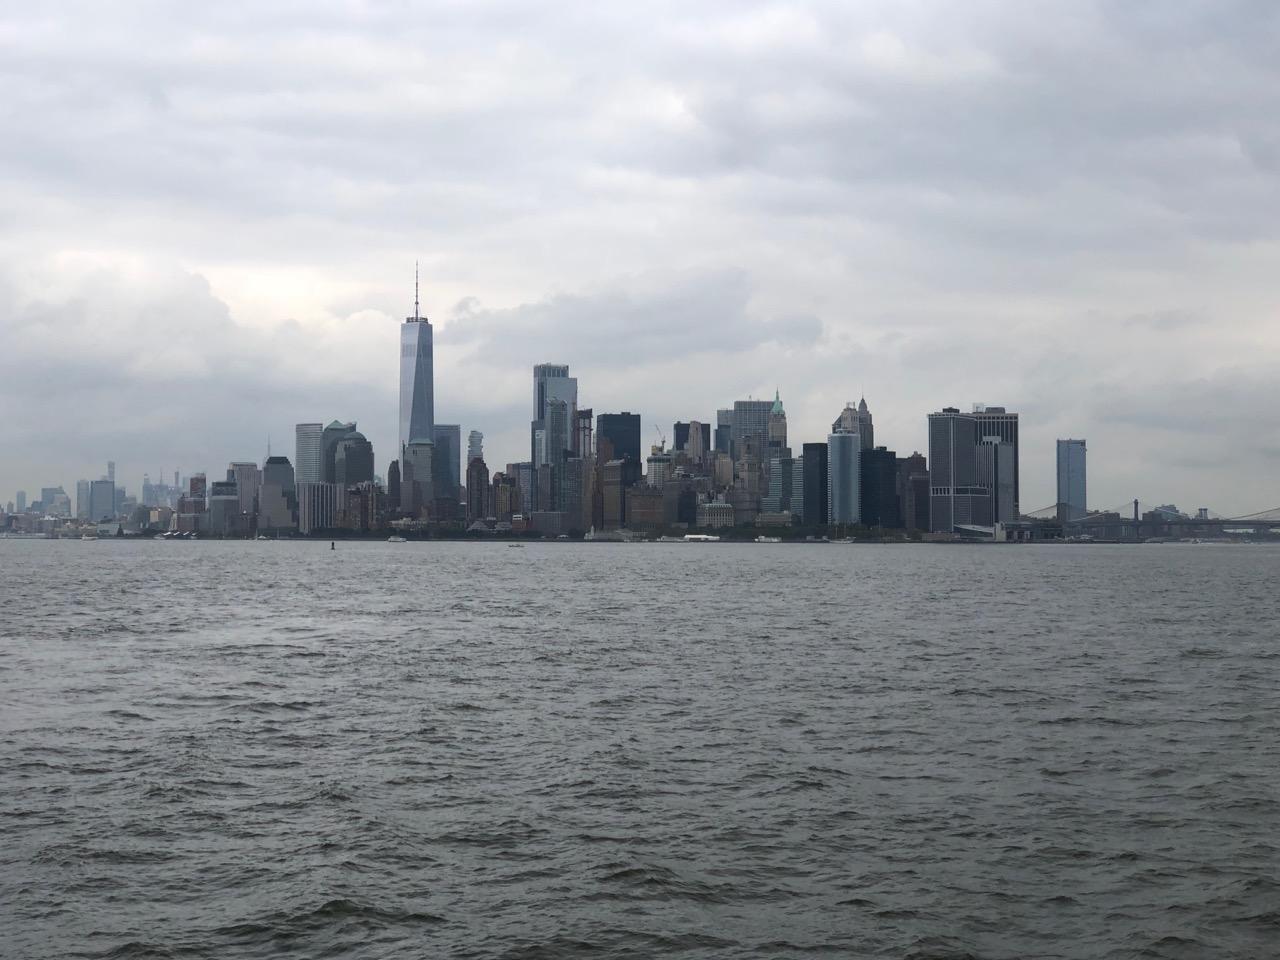 Lower Manhattan, NY